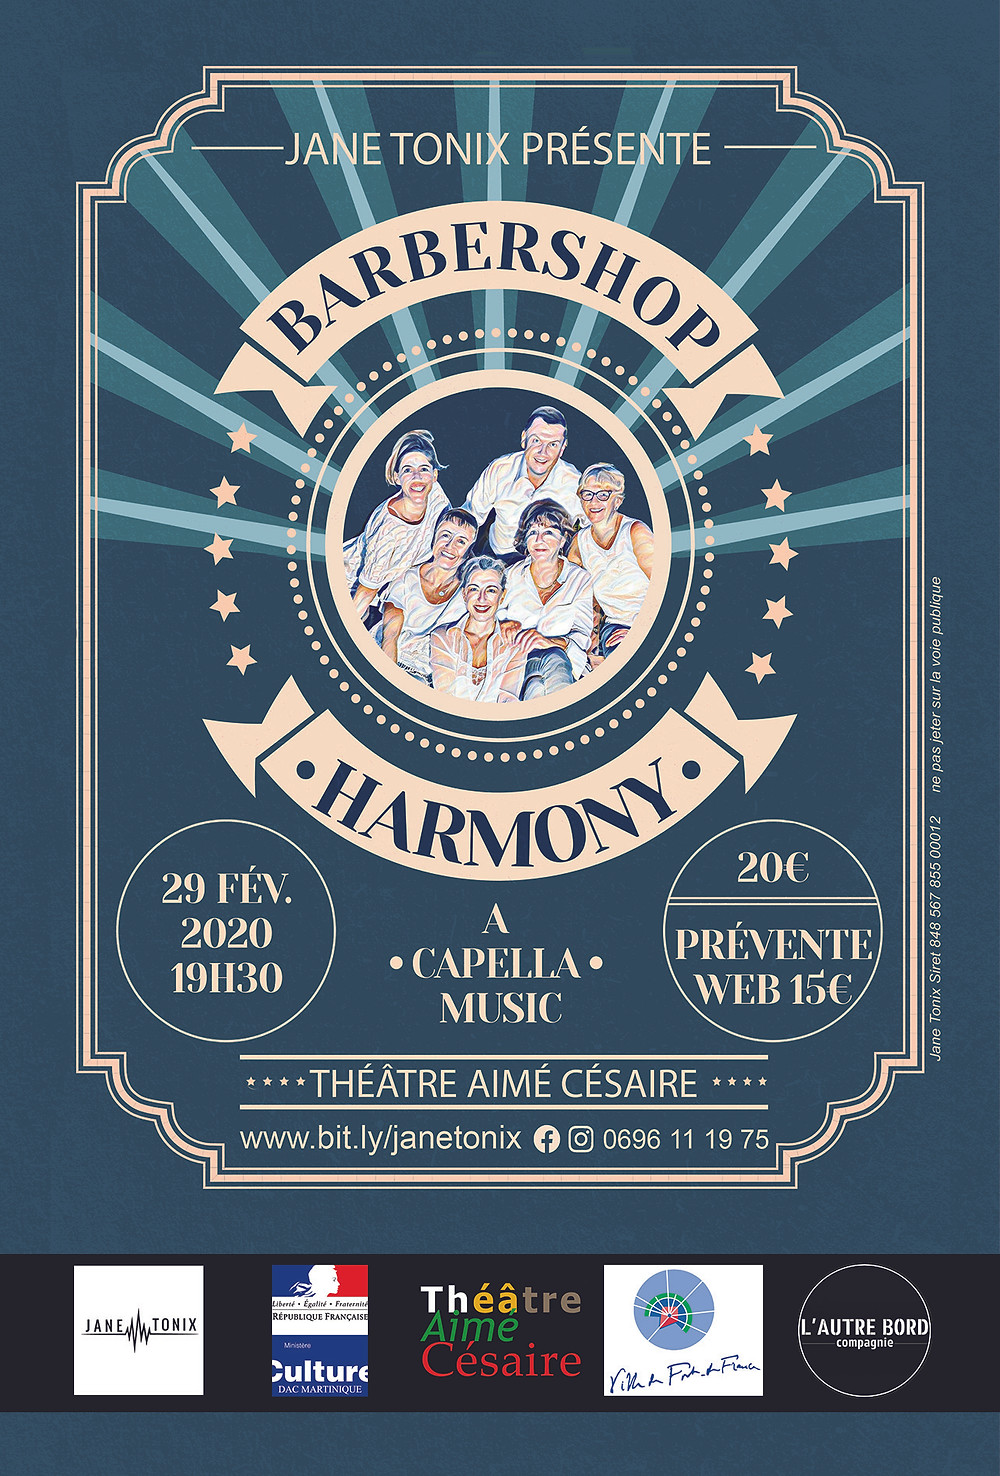 Jane Tonix Barbershop Harmony